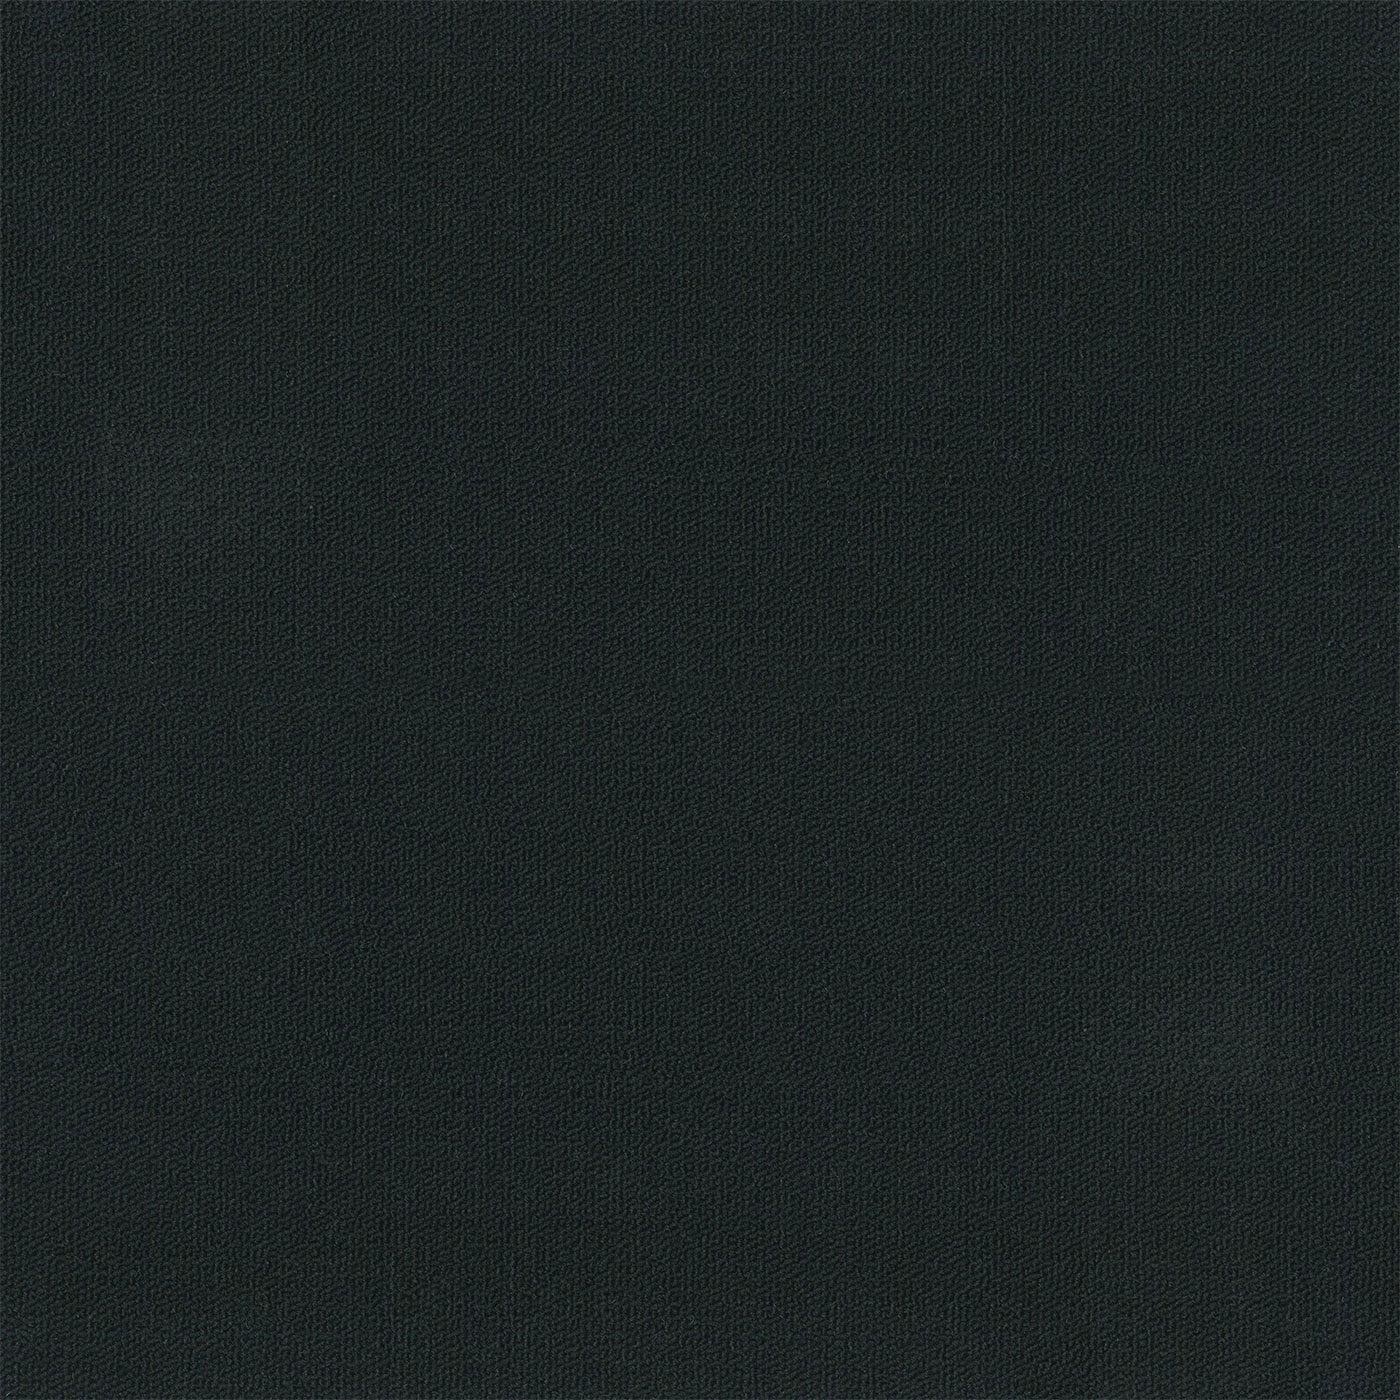 black - photo #37